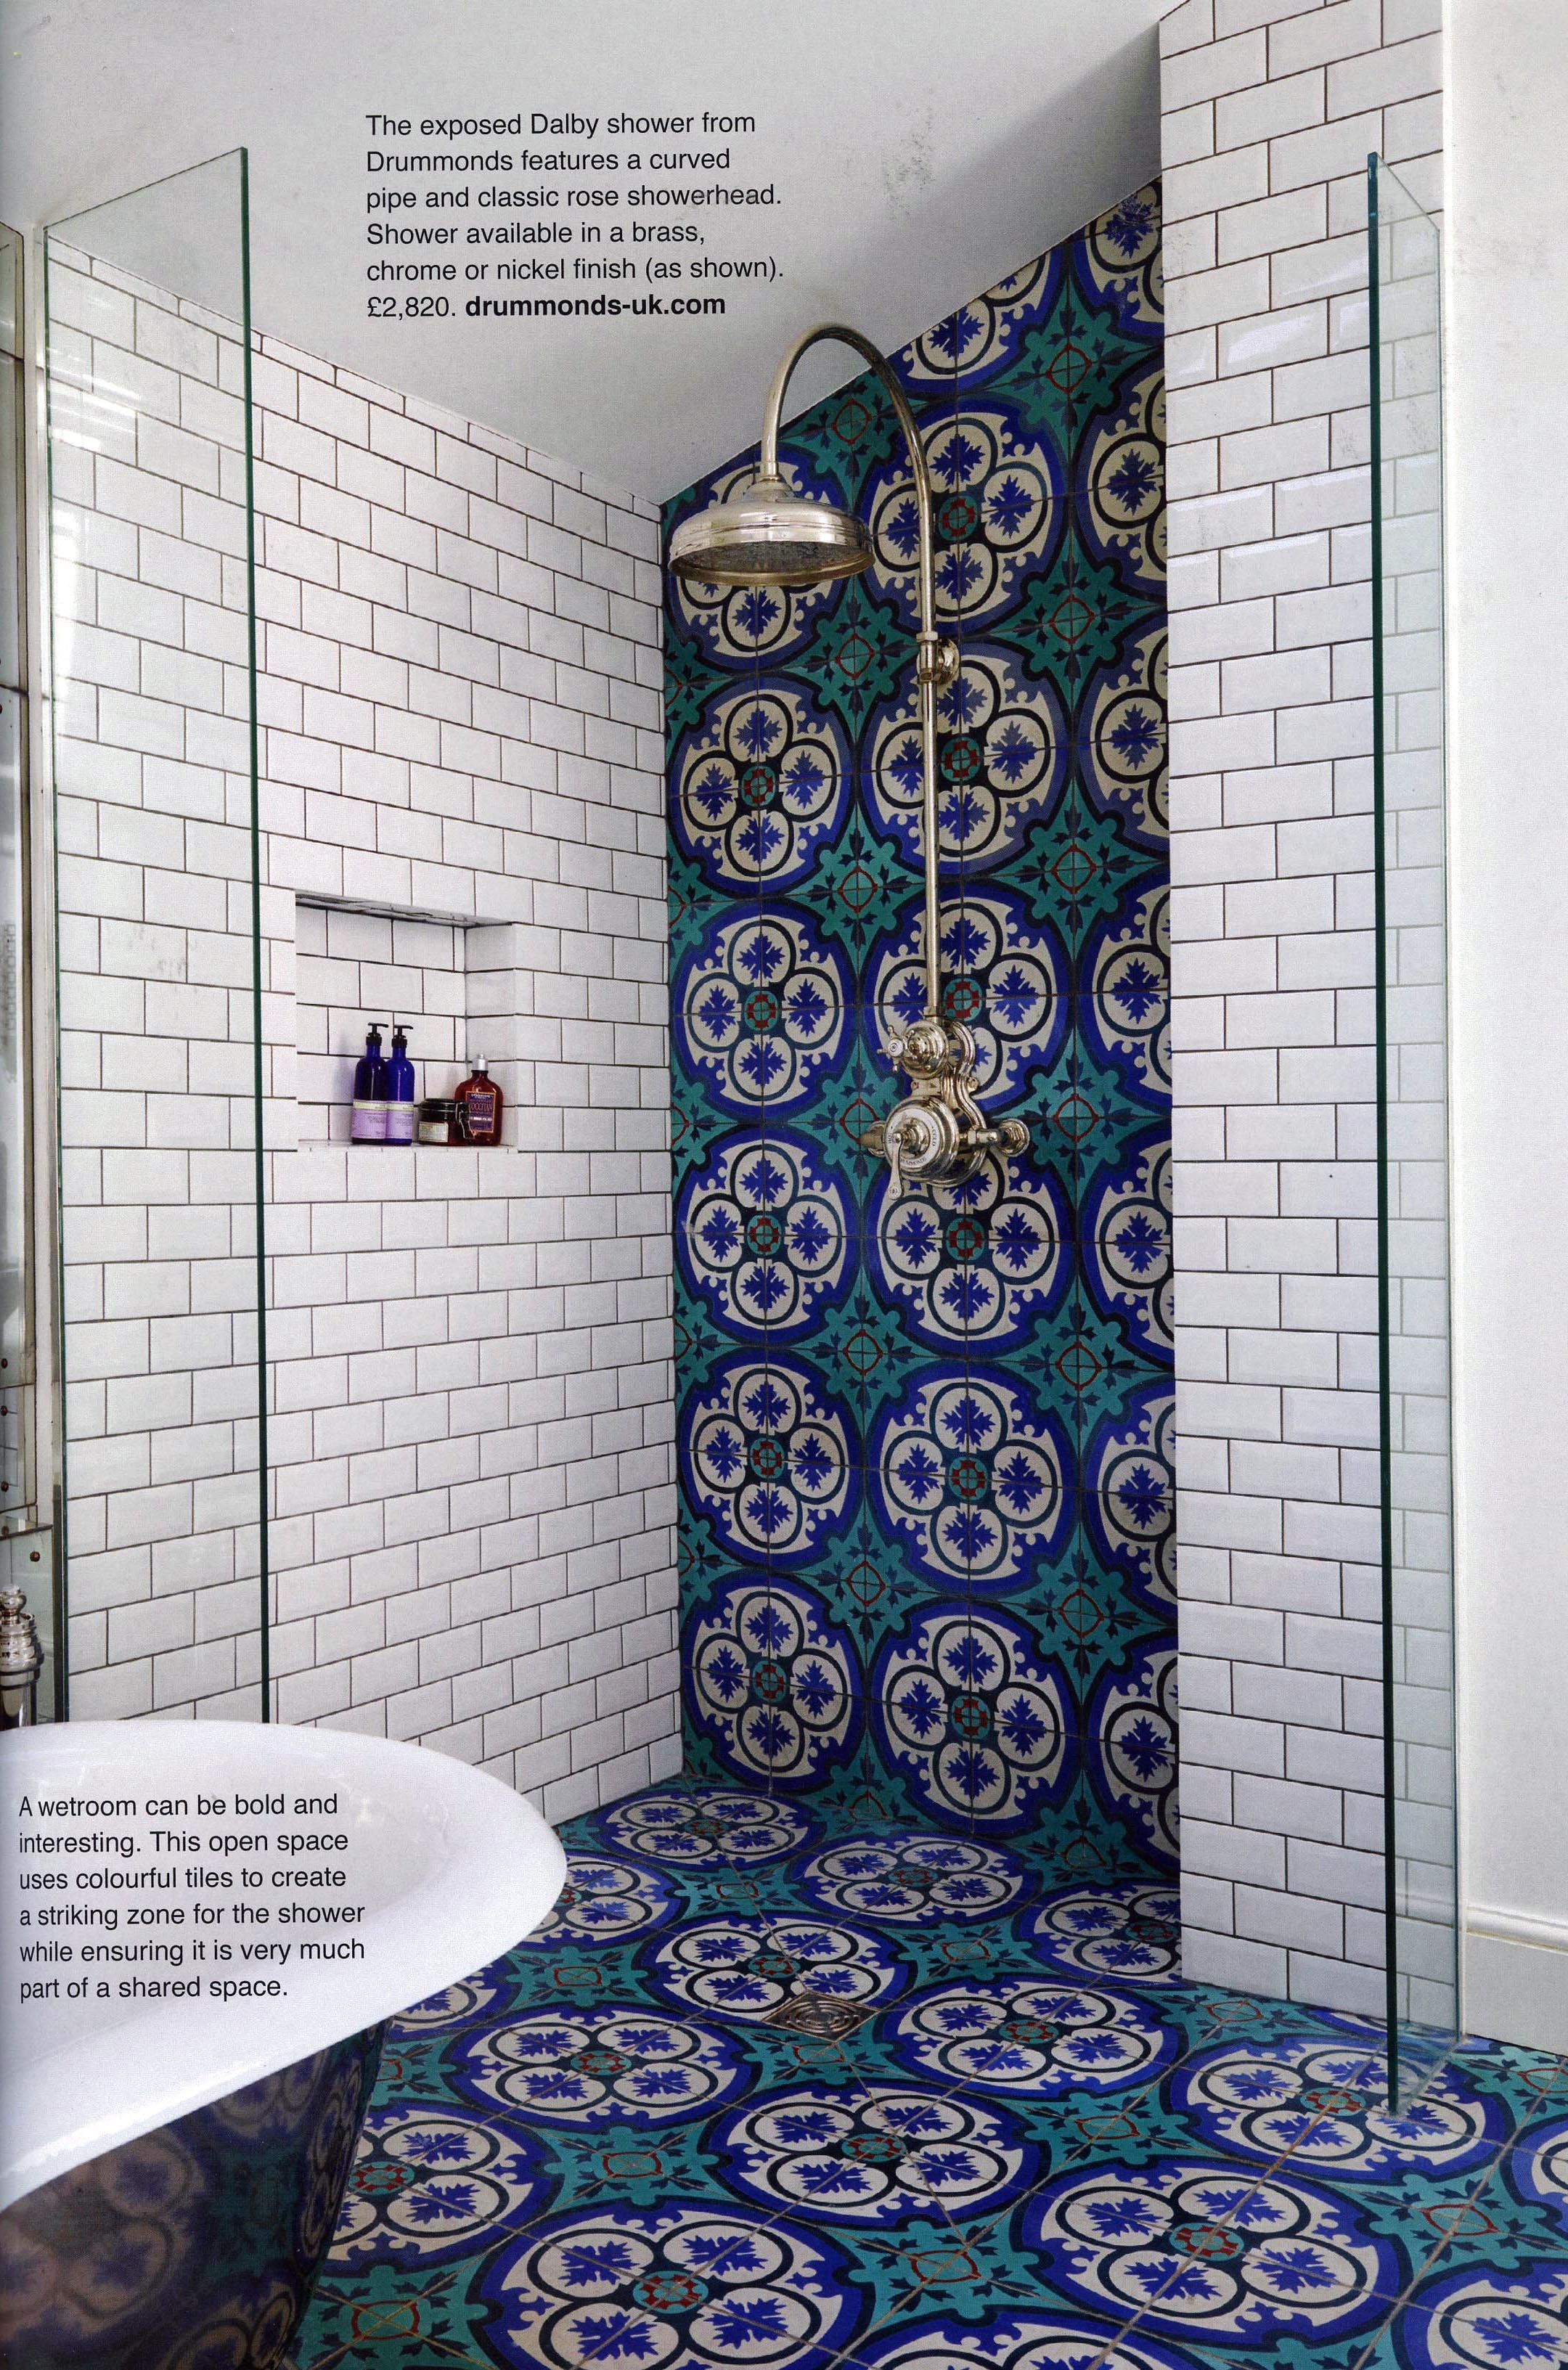 The Elegant Dalby Shower From Drummonds Http Www Drummonds Uk Com Utopia Kitchen Bathroom August 2016 Latest bathroom ceramic motif